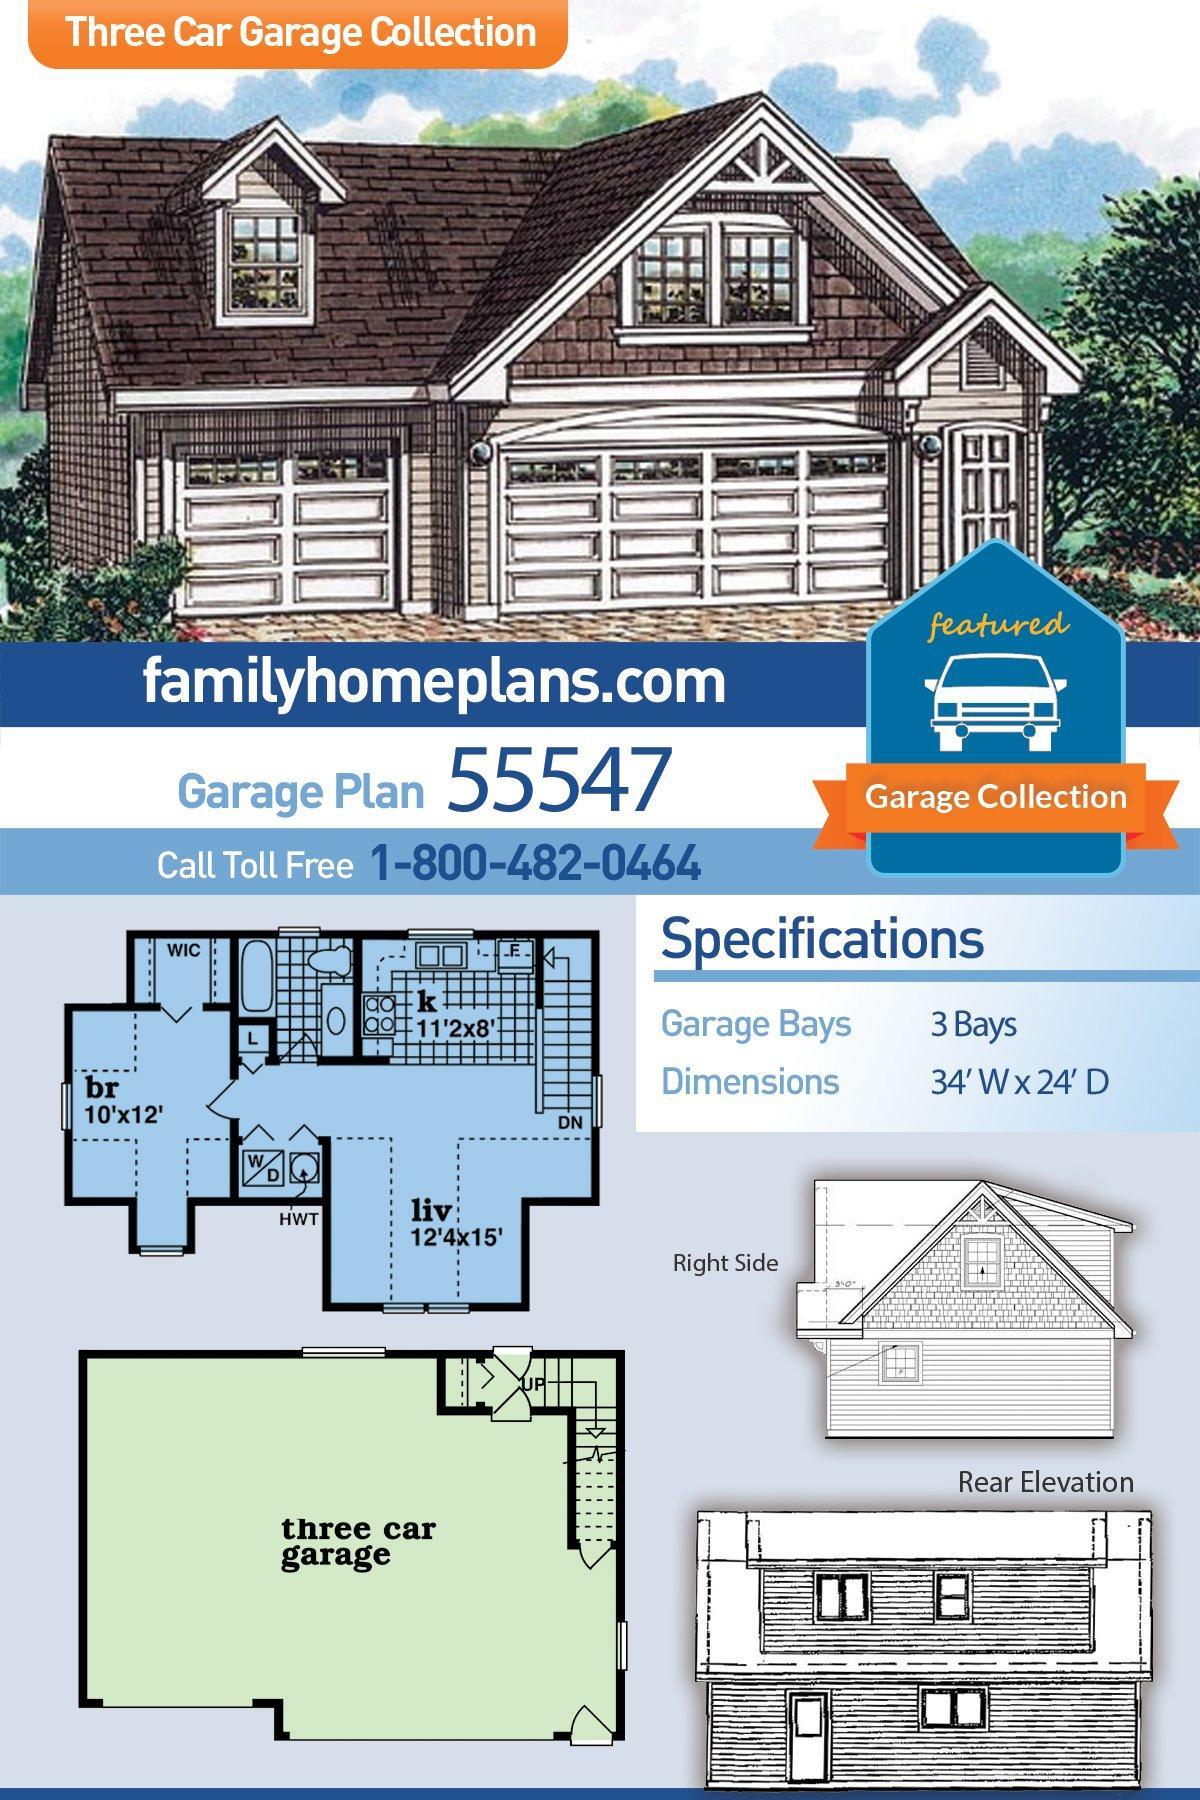 Cape Cod 3 Car Garage Apartment Plan 55547 with 1 Beds, 1 Baths